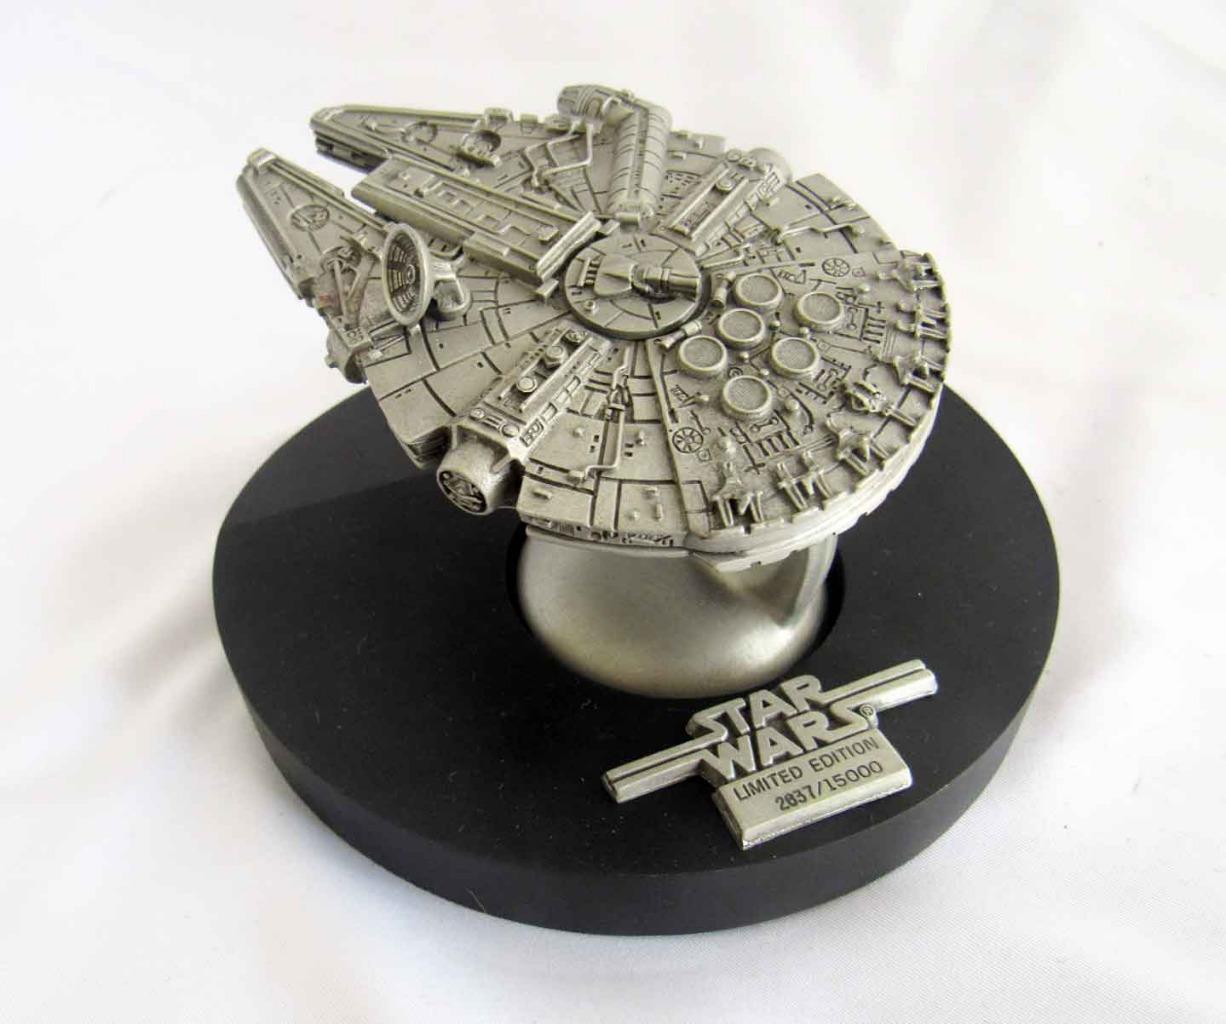 Vintage Star Wars Rawcliffe Fine Pewter Millennium Falcon RF951 -  2387 of 15000